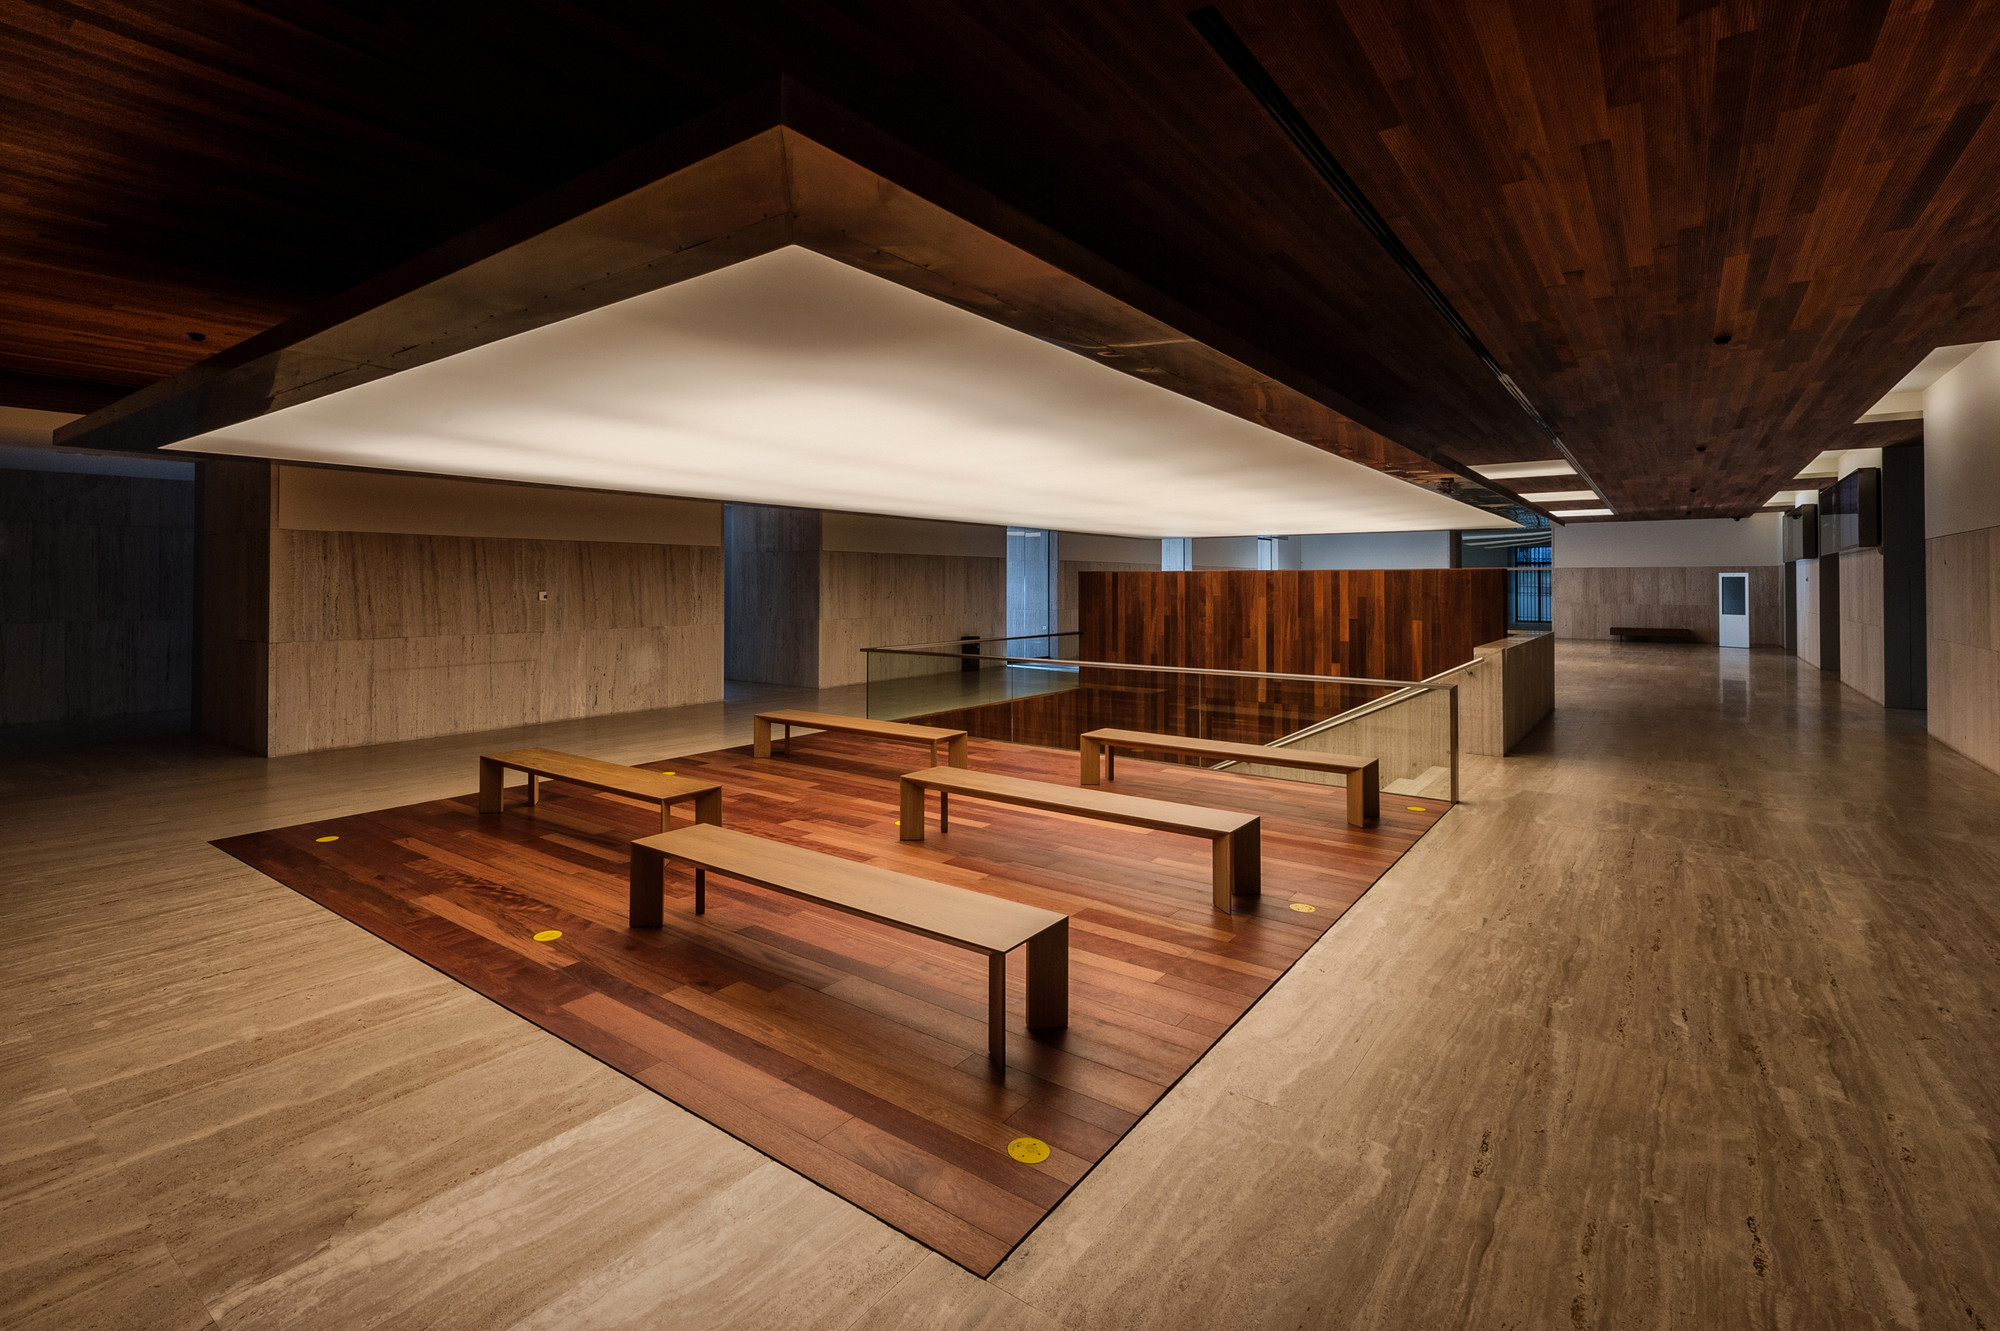 Museo Arqueológico Nacional / Frade Arquitectos, © Niccolo Guasti